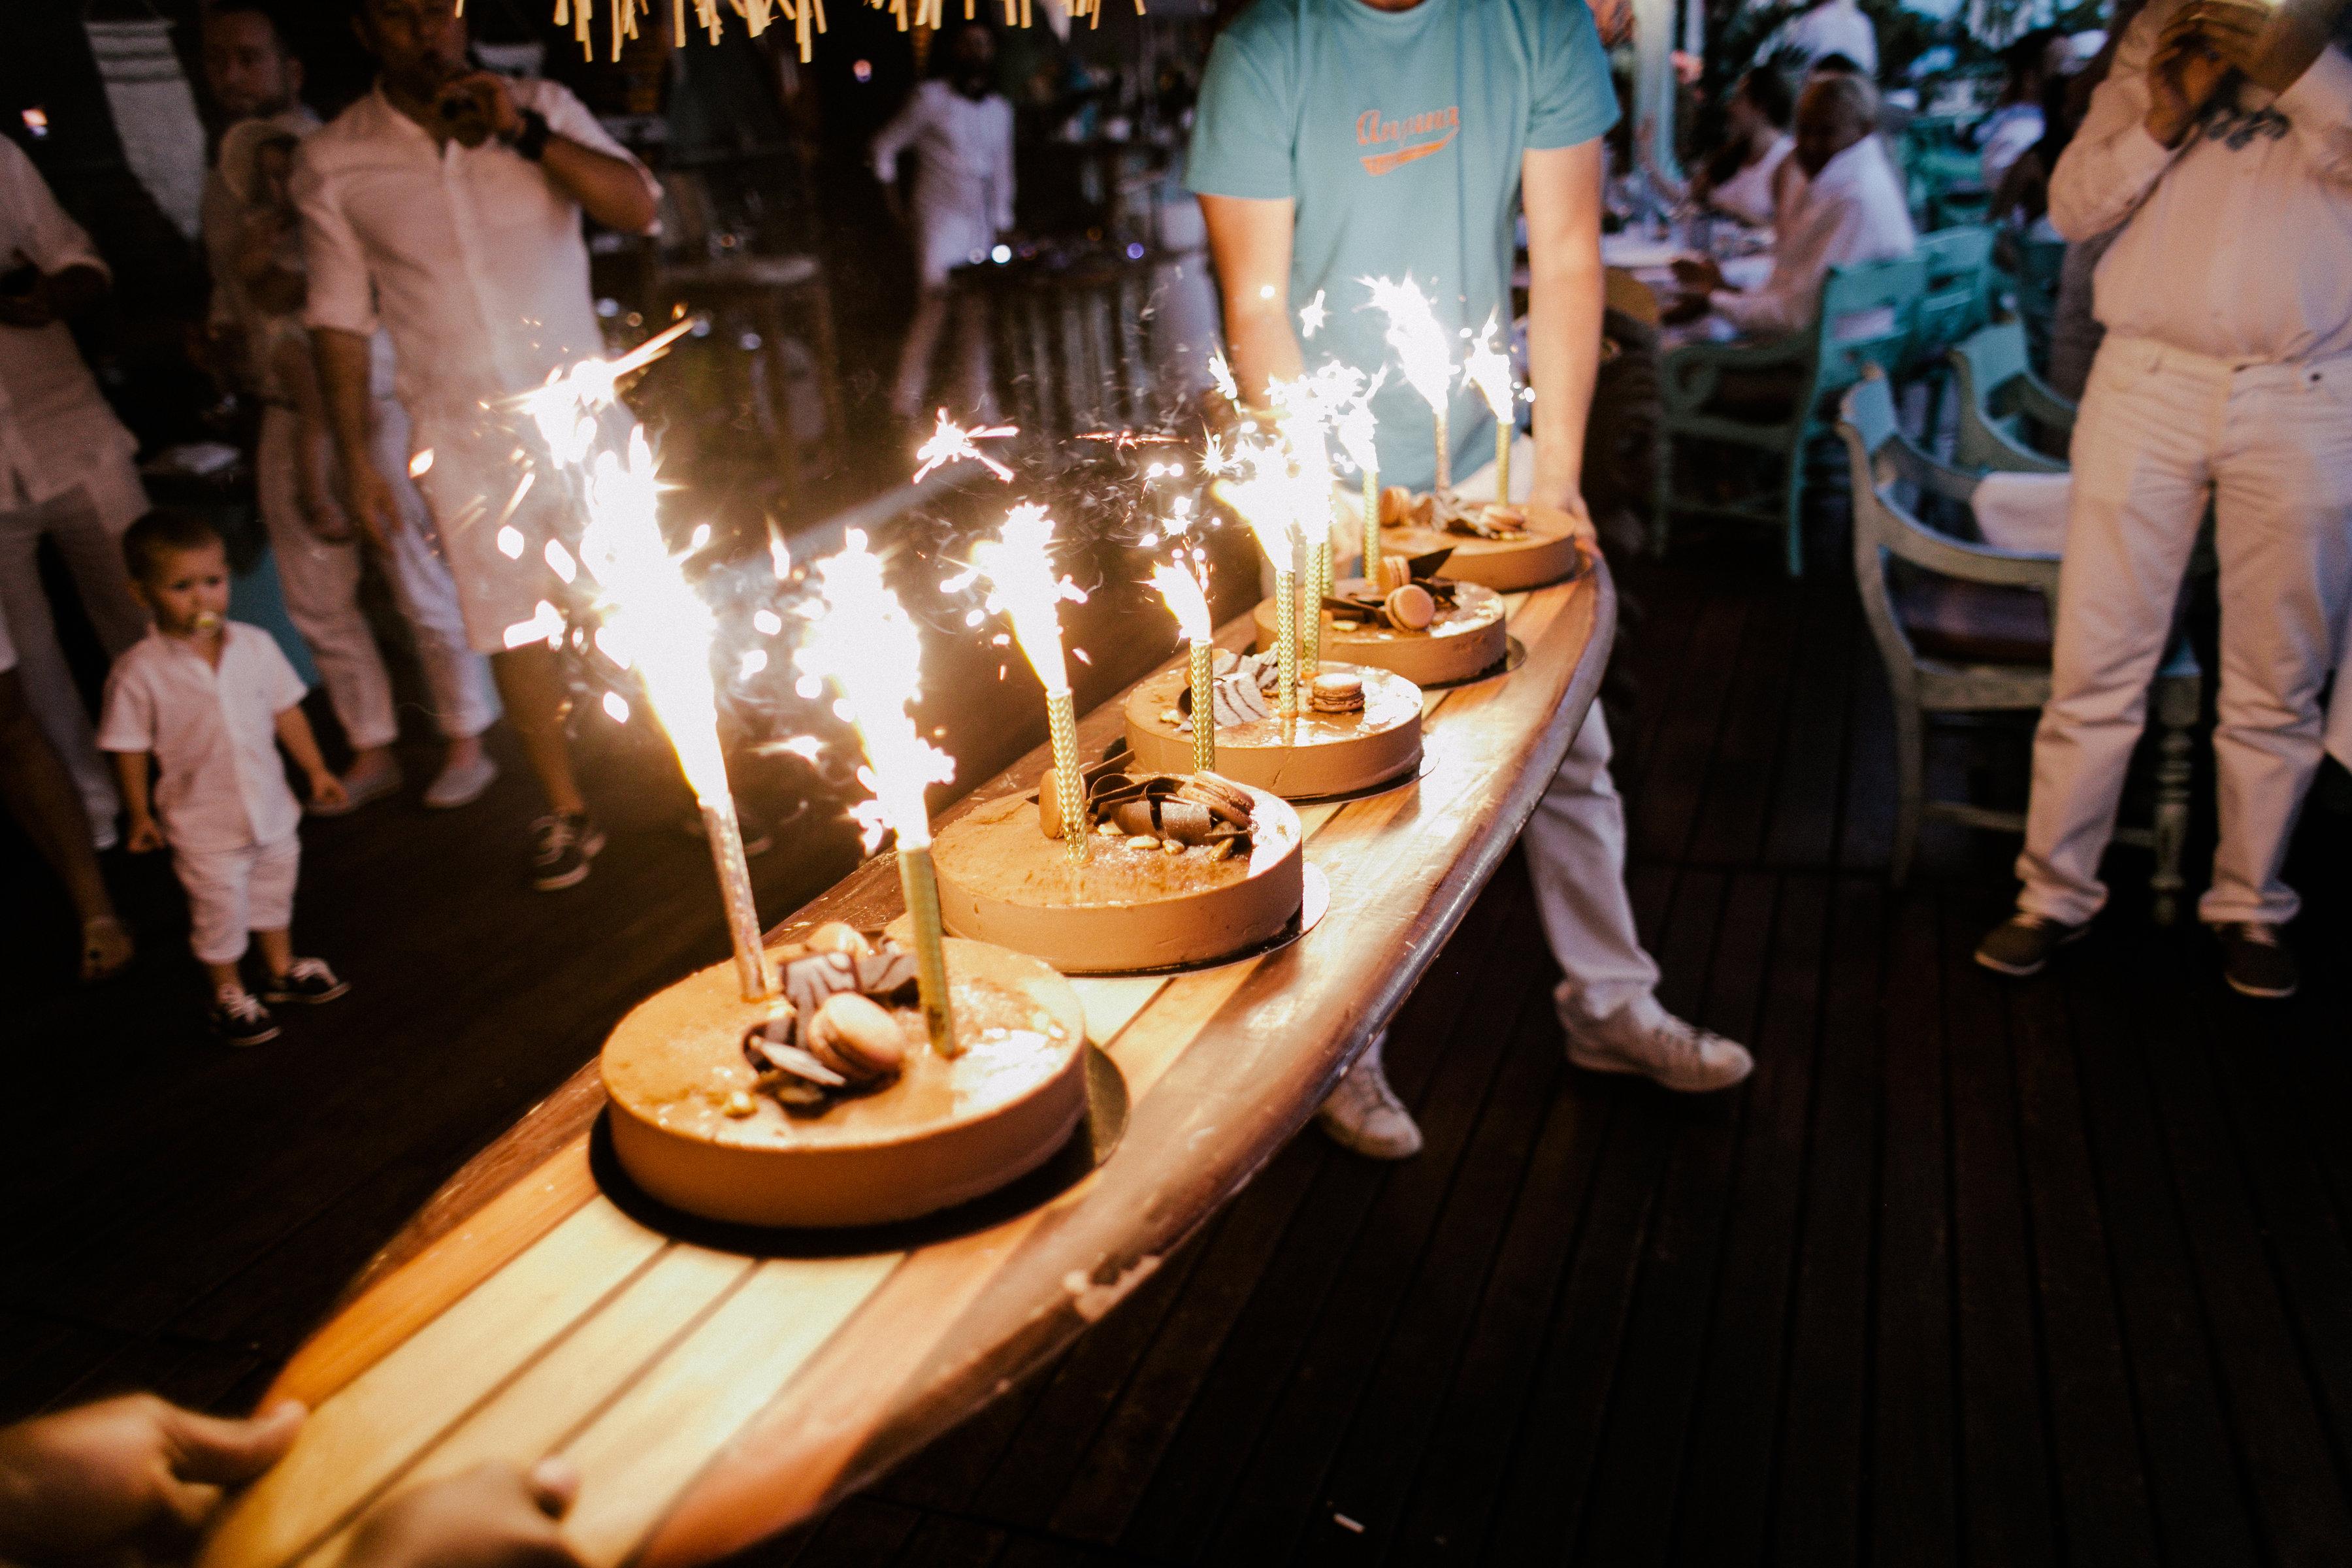 Wedding cake served at Anjuna, a beach restaurant by the Mediterranean Sea.